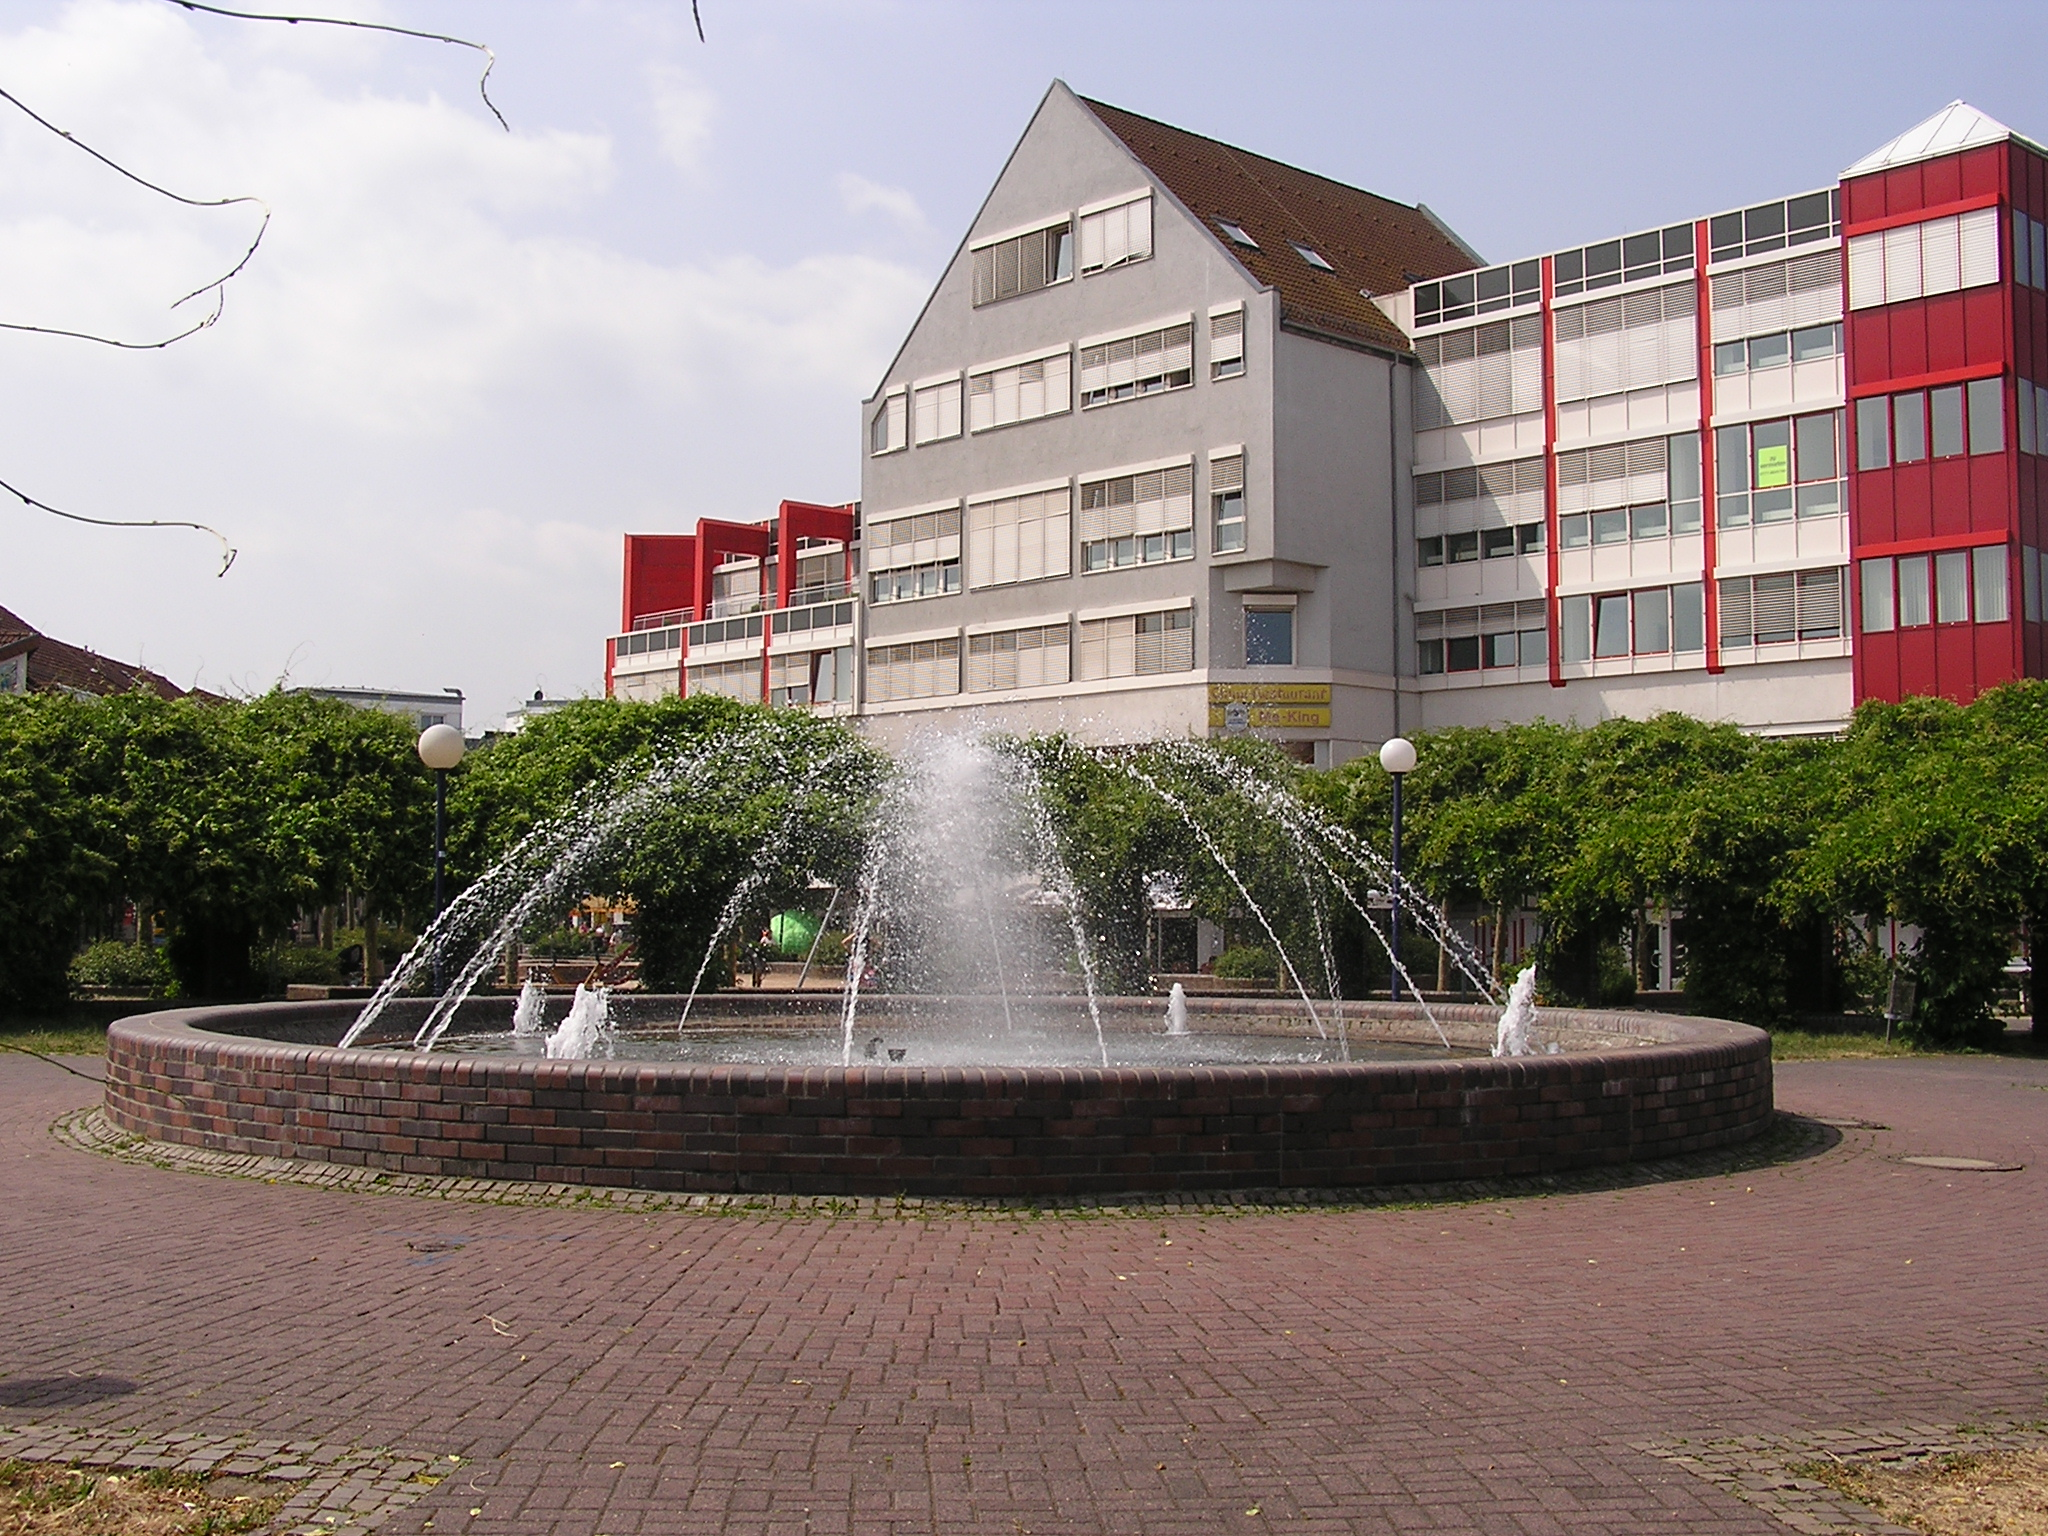 Houiller Platz Friedrichsdorf